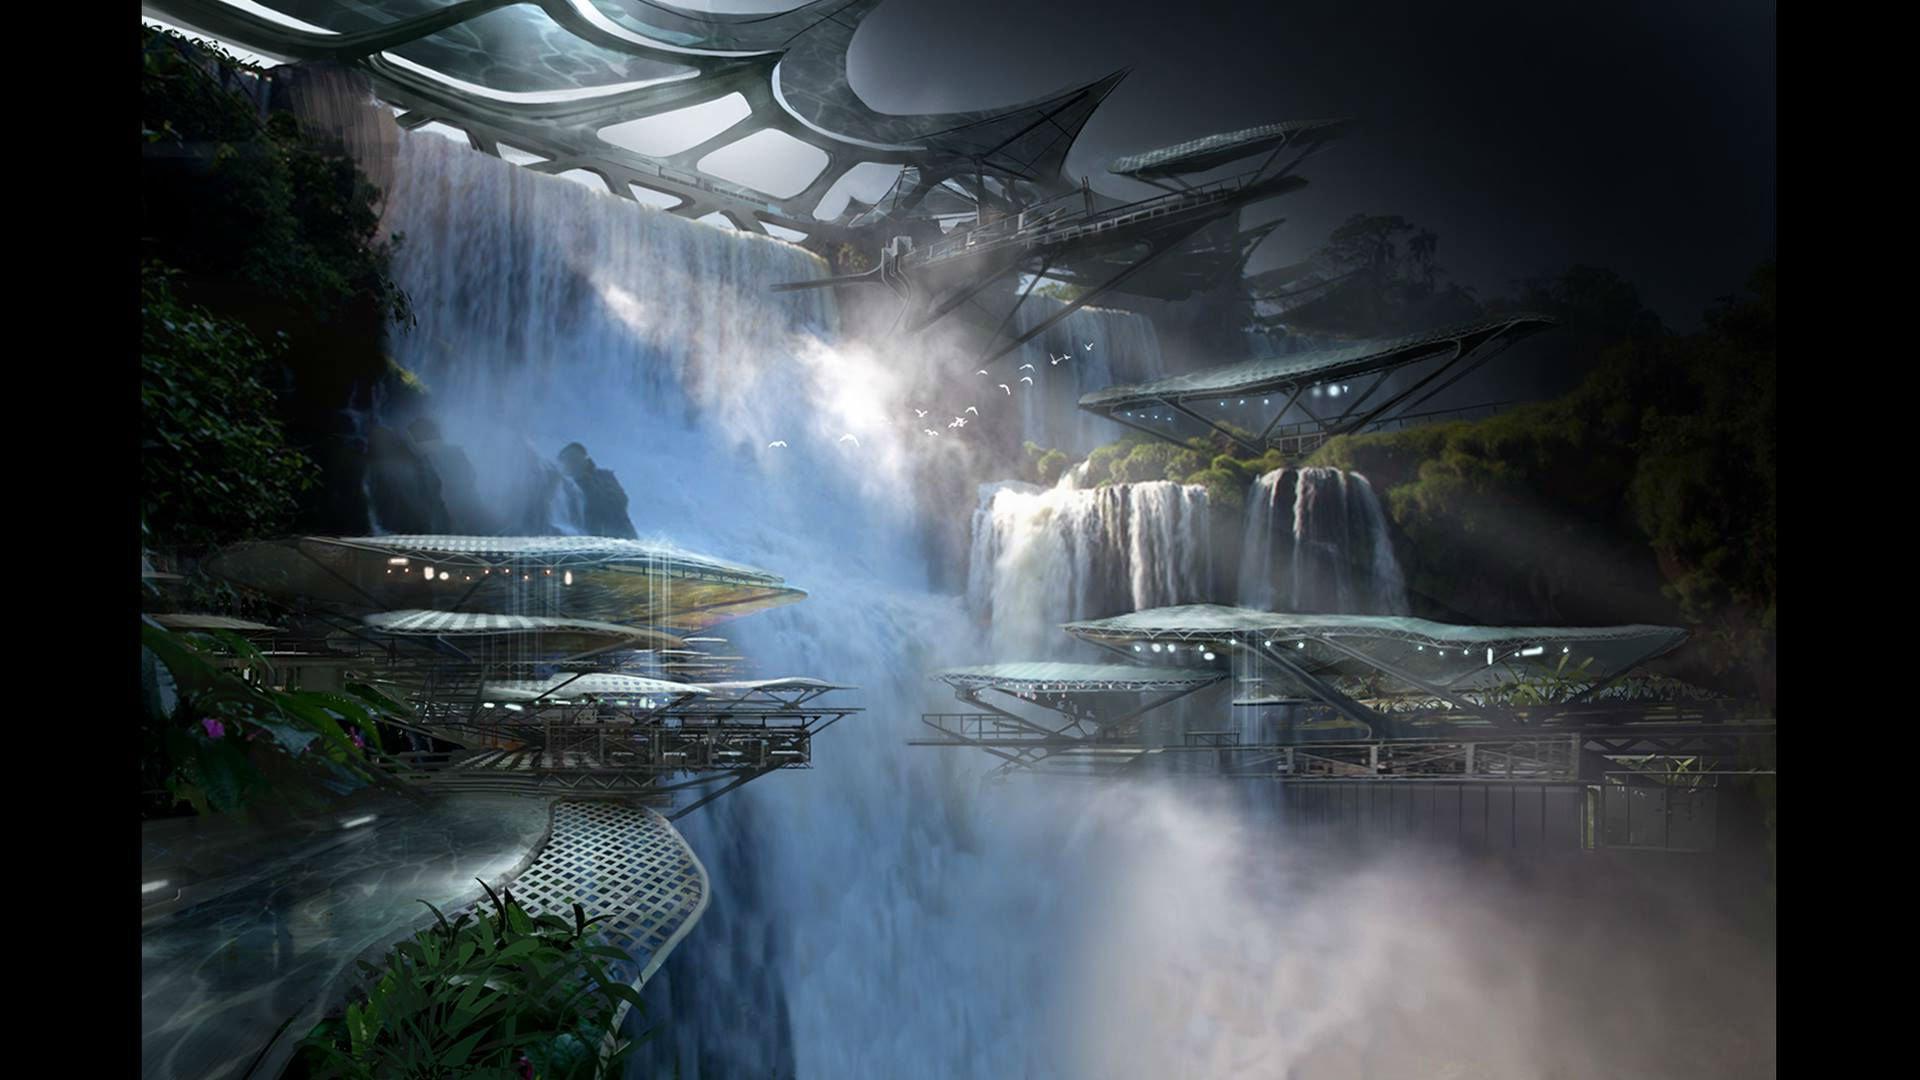 Wallpaper Hd Light Effect Wallpaper: MASS EFFECT 4 Andromeda Sci-fi Shooter Action Futuristic